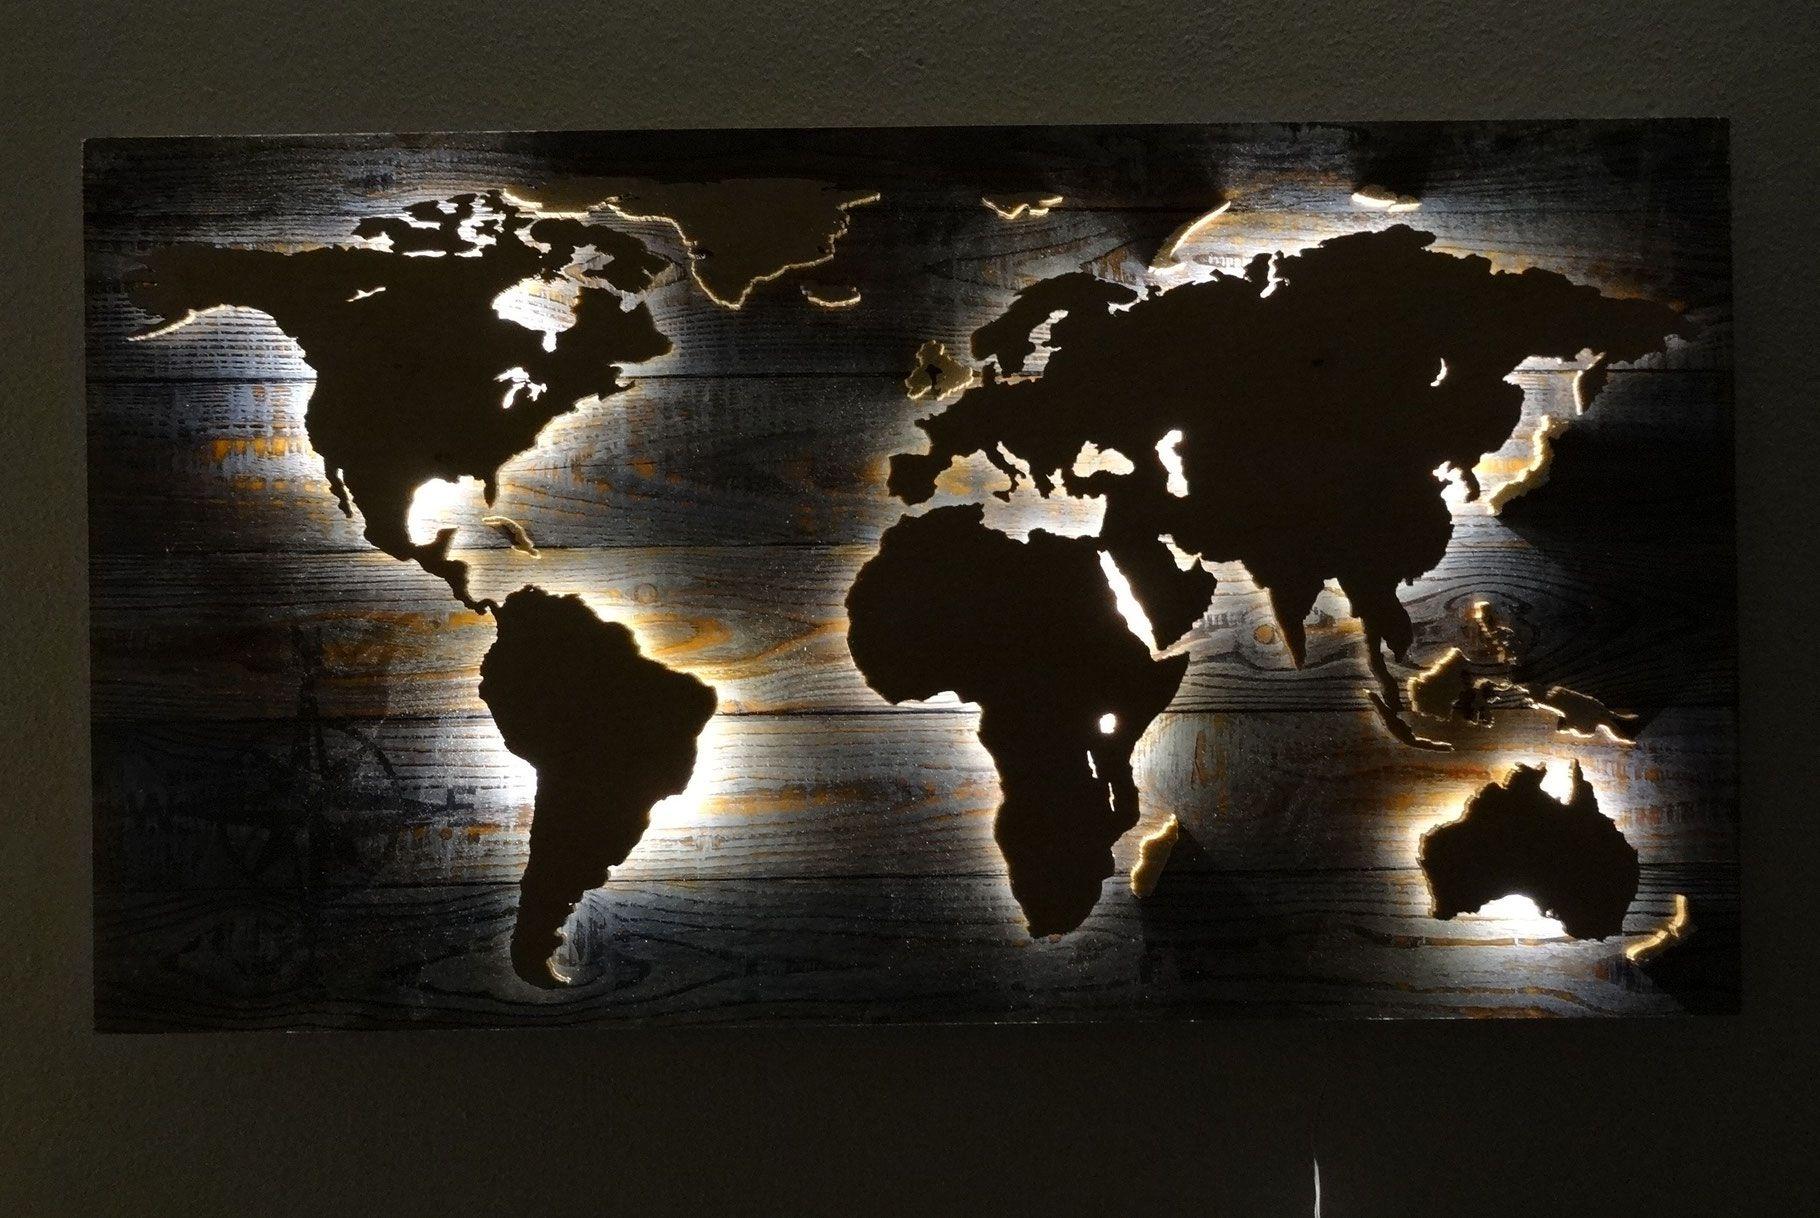 Weltkarte aus Holz Wandbild LED Beleuchtung | Dekoration | Pinterest ...